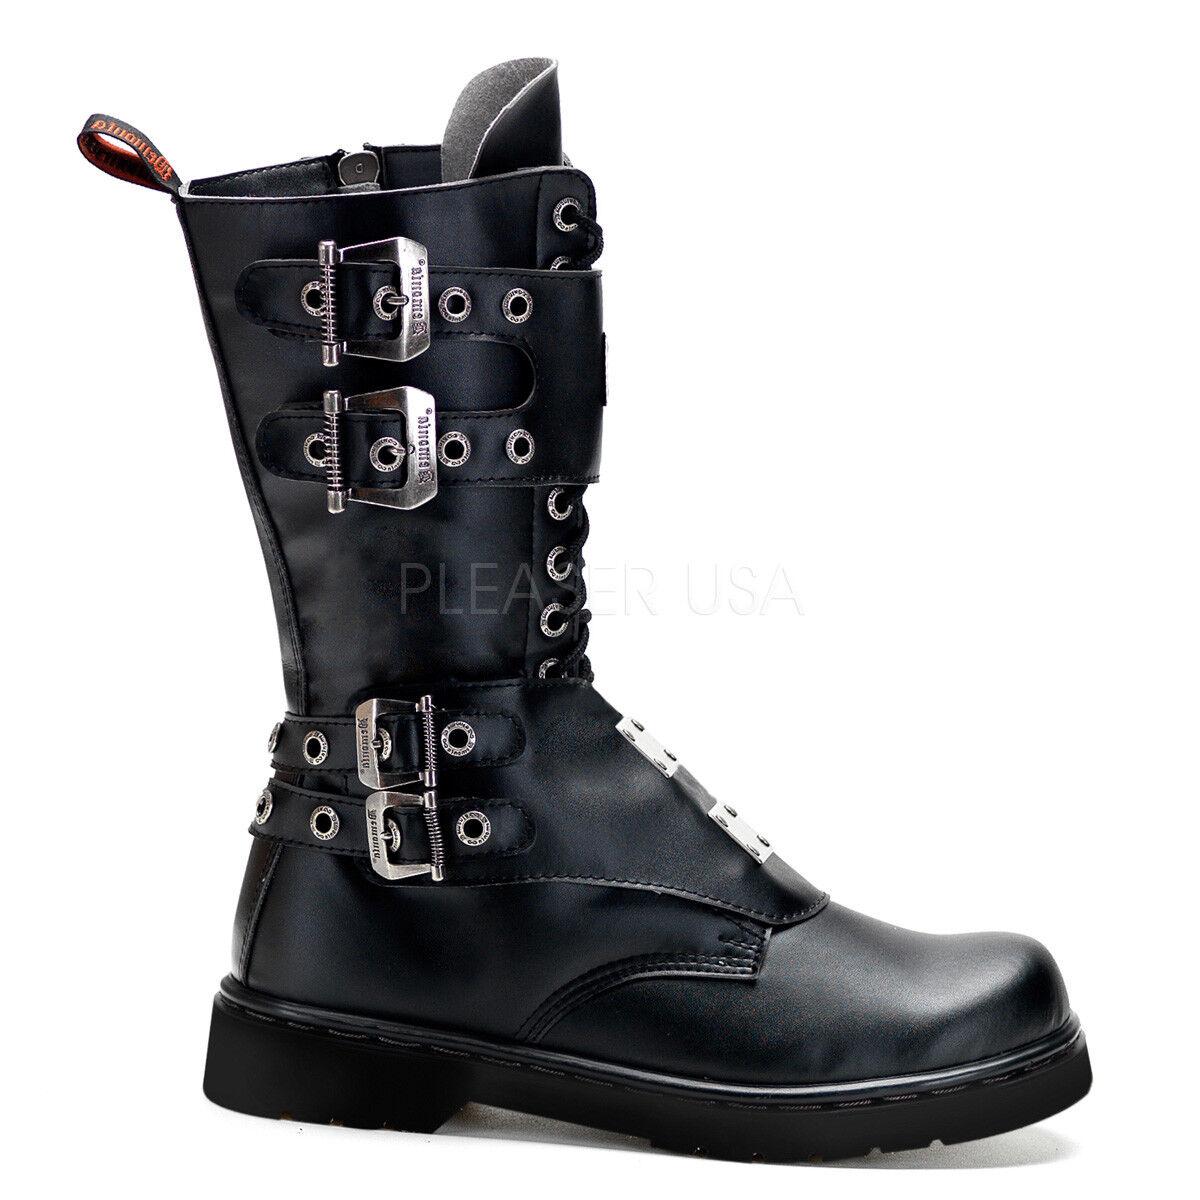 Demonia DEFIANT-302 Black 14 Eyelet Vegan Combat Boot Steel Plate Panels Zipper